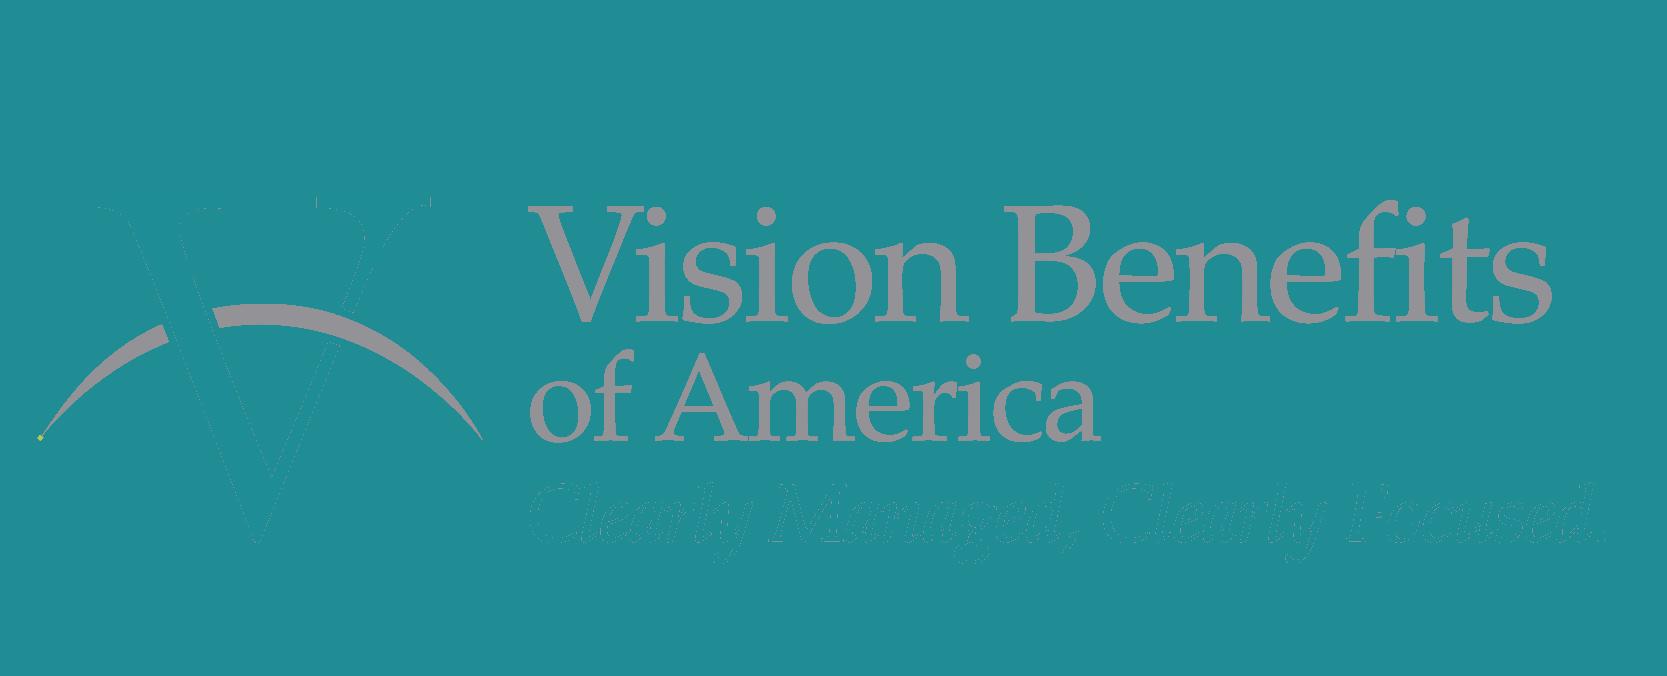 Vision Benefits of America